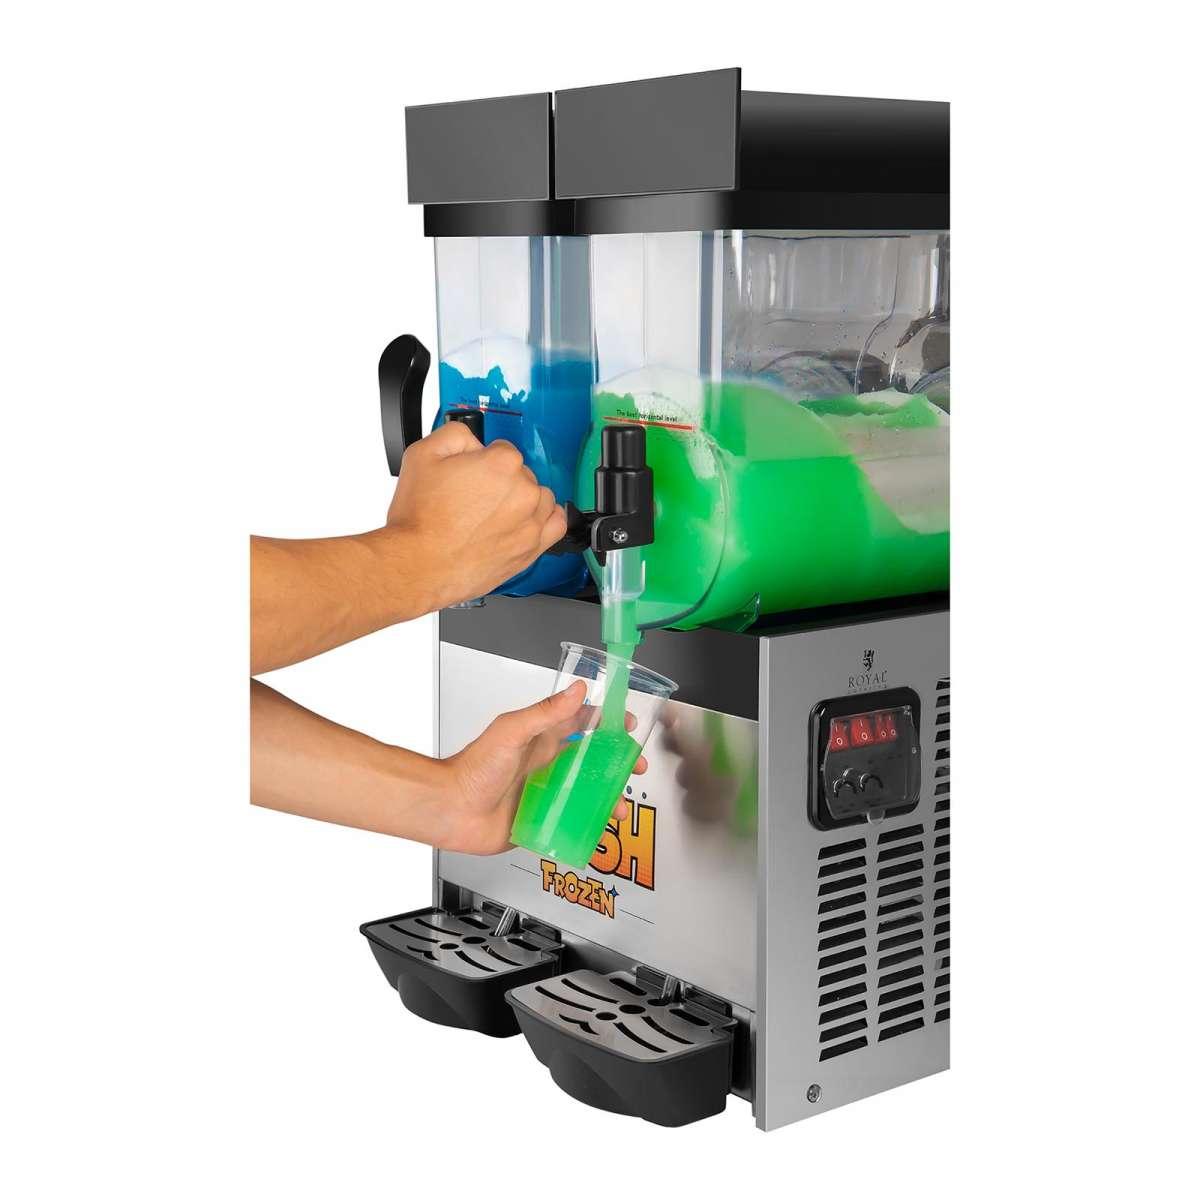 Slush Ice Maschine - Quelle www.expondo.de - Foodblog Topfgartenwelt